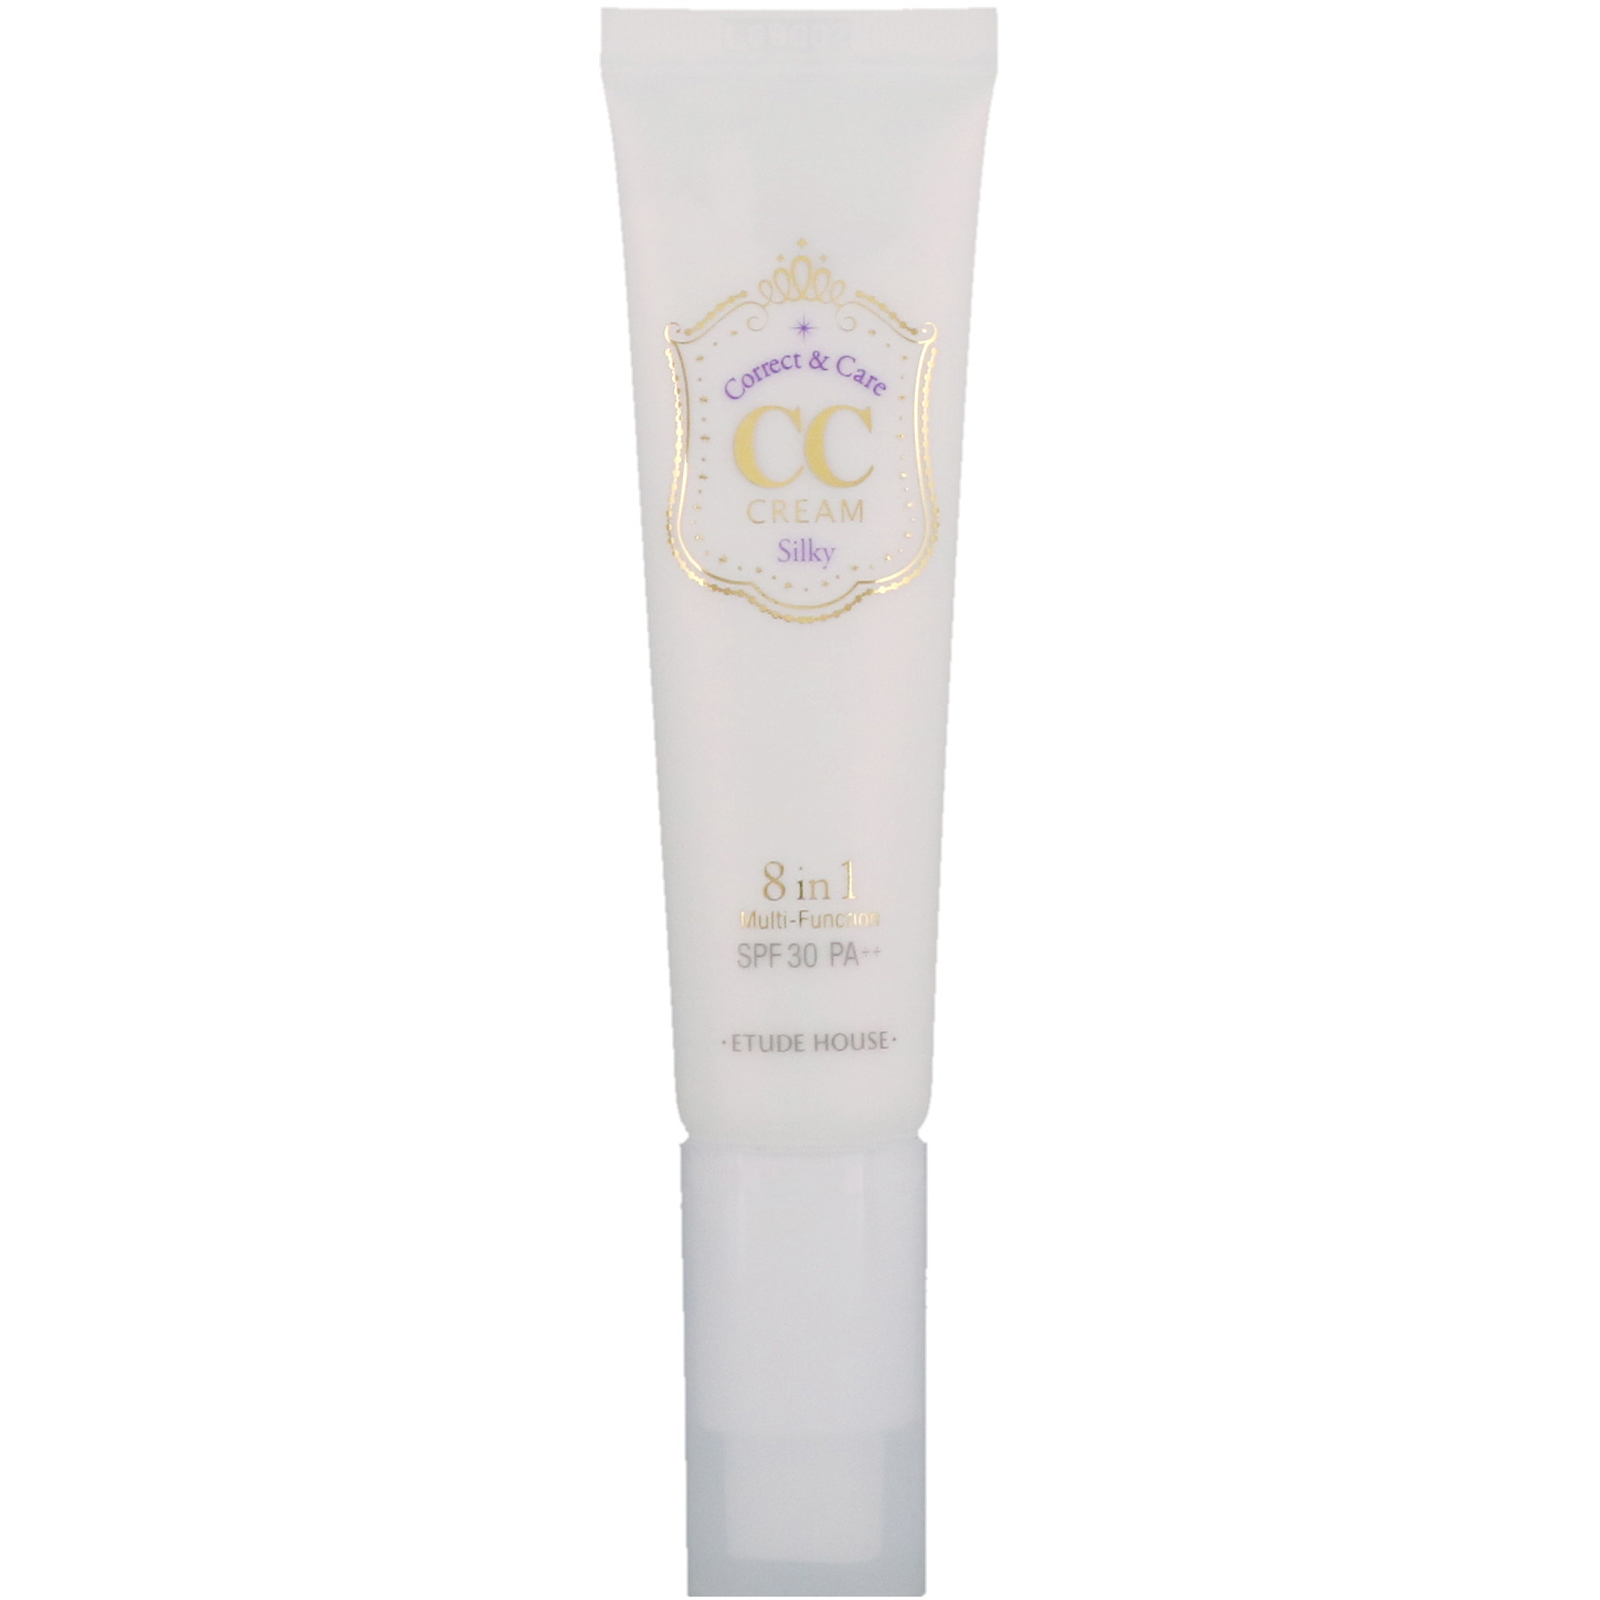 Etude House Correct Care Cc Cream Spf 30 Pa Silky 123 Oz 35 By Click To Zoom